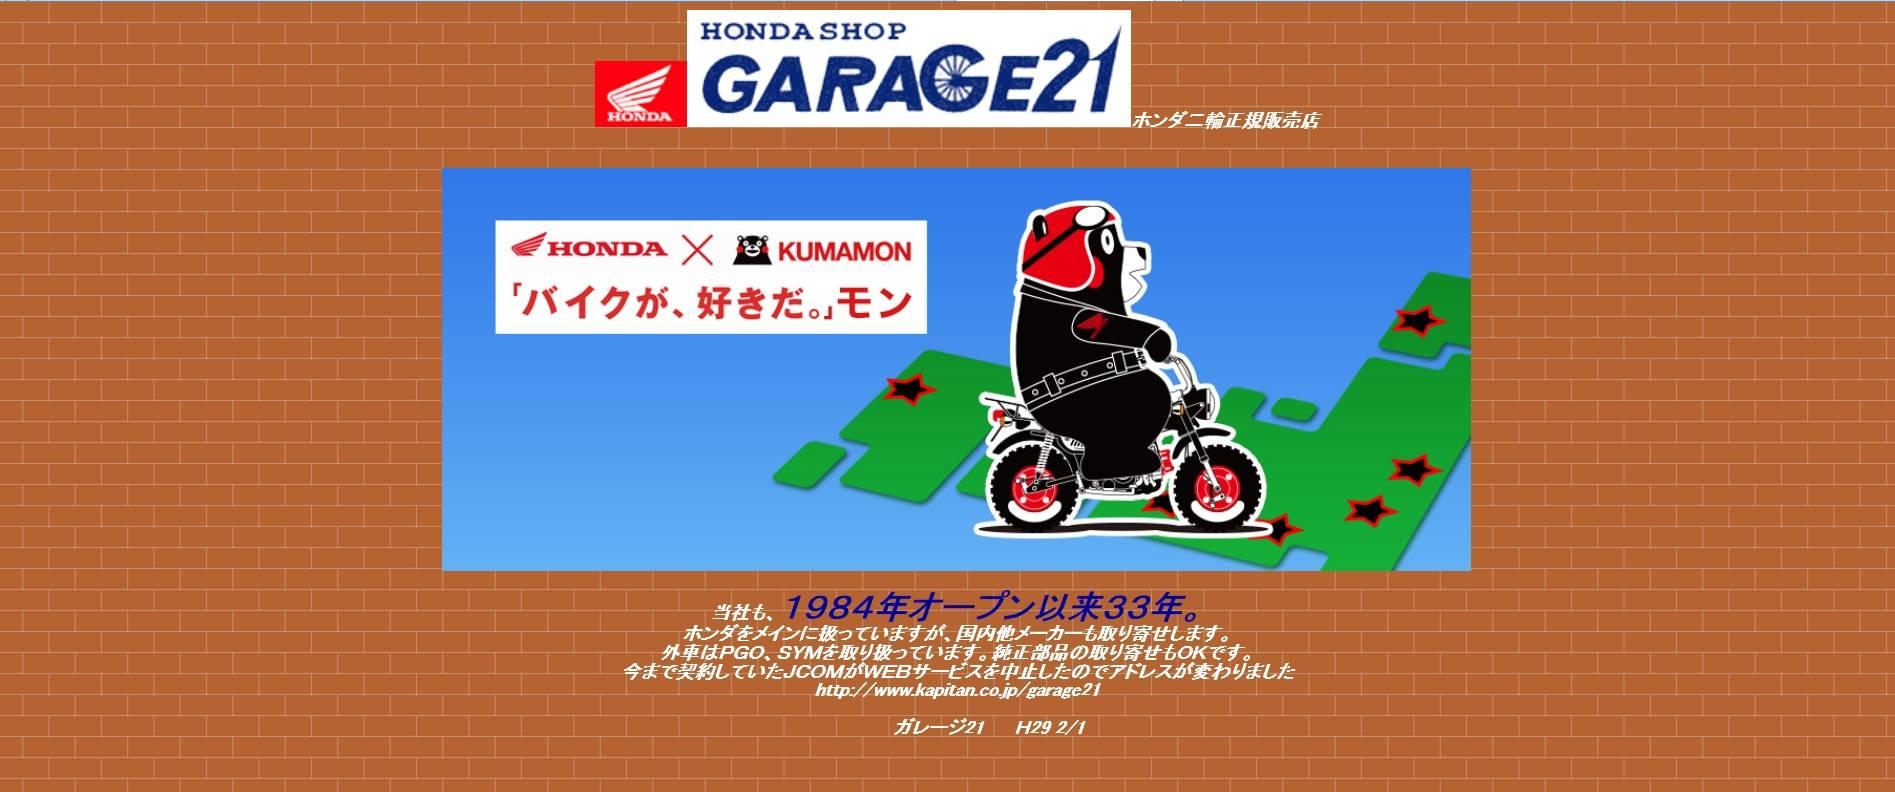 GARAGE 21 本店